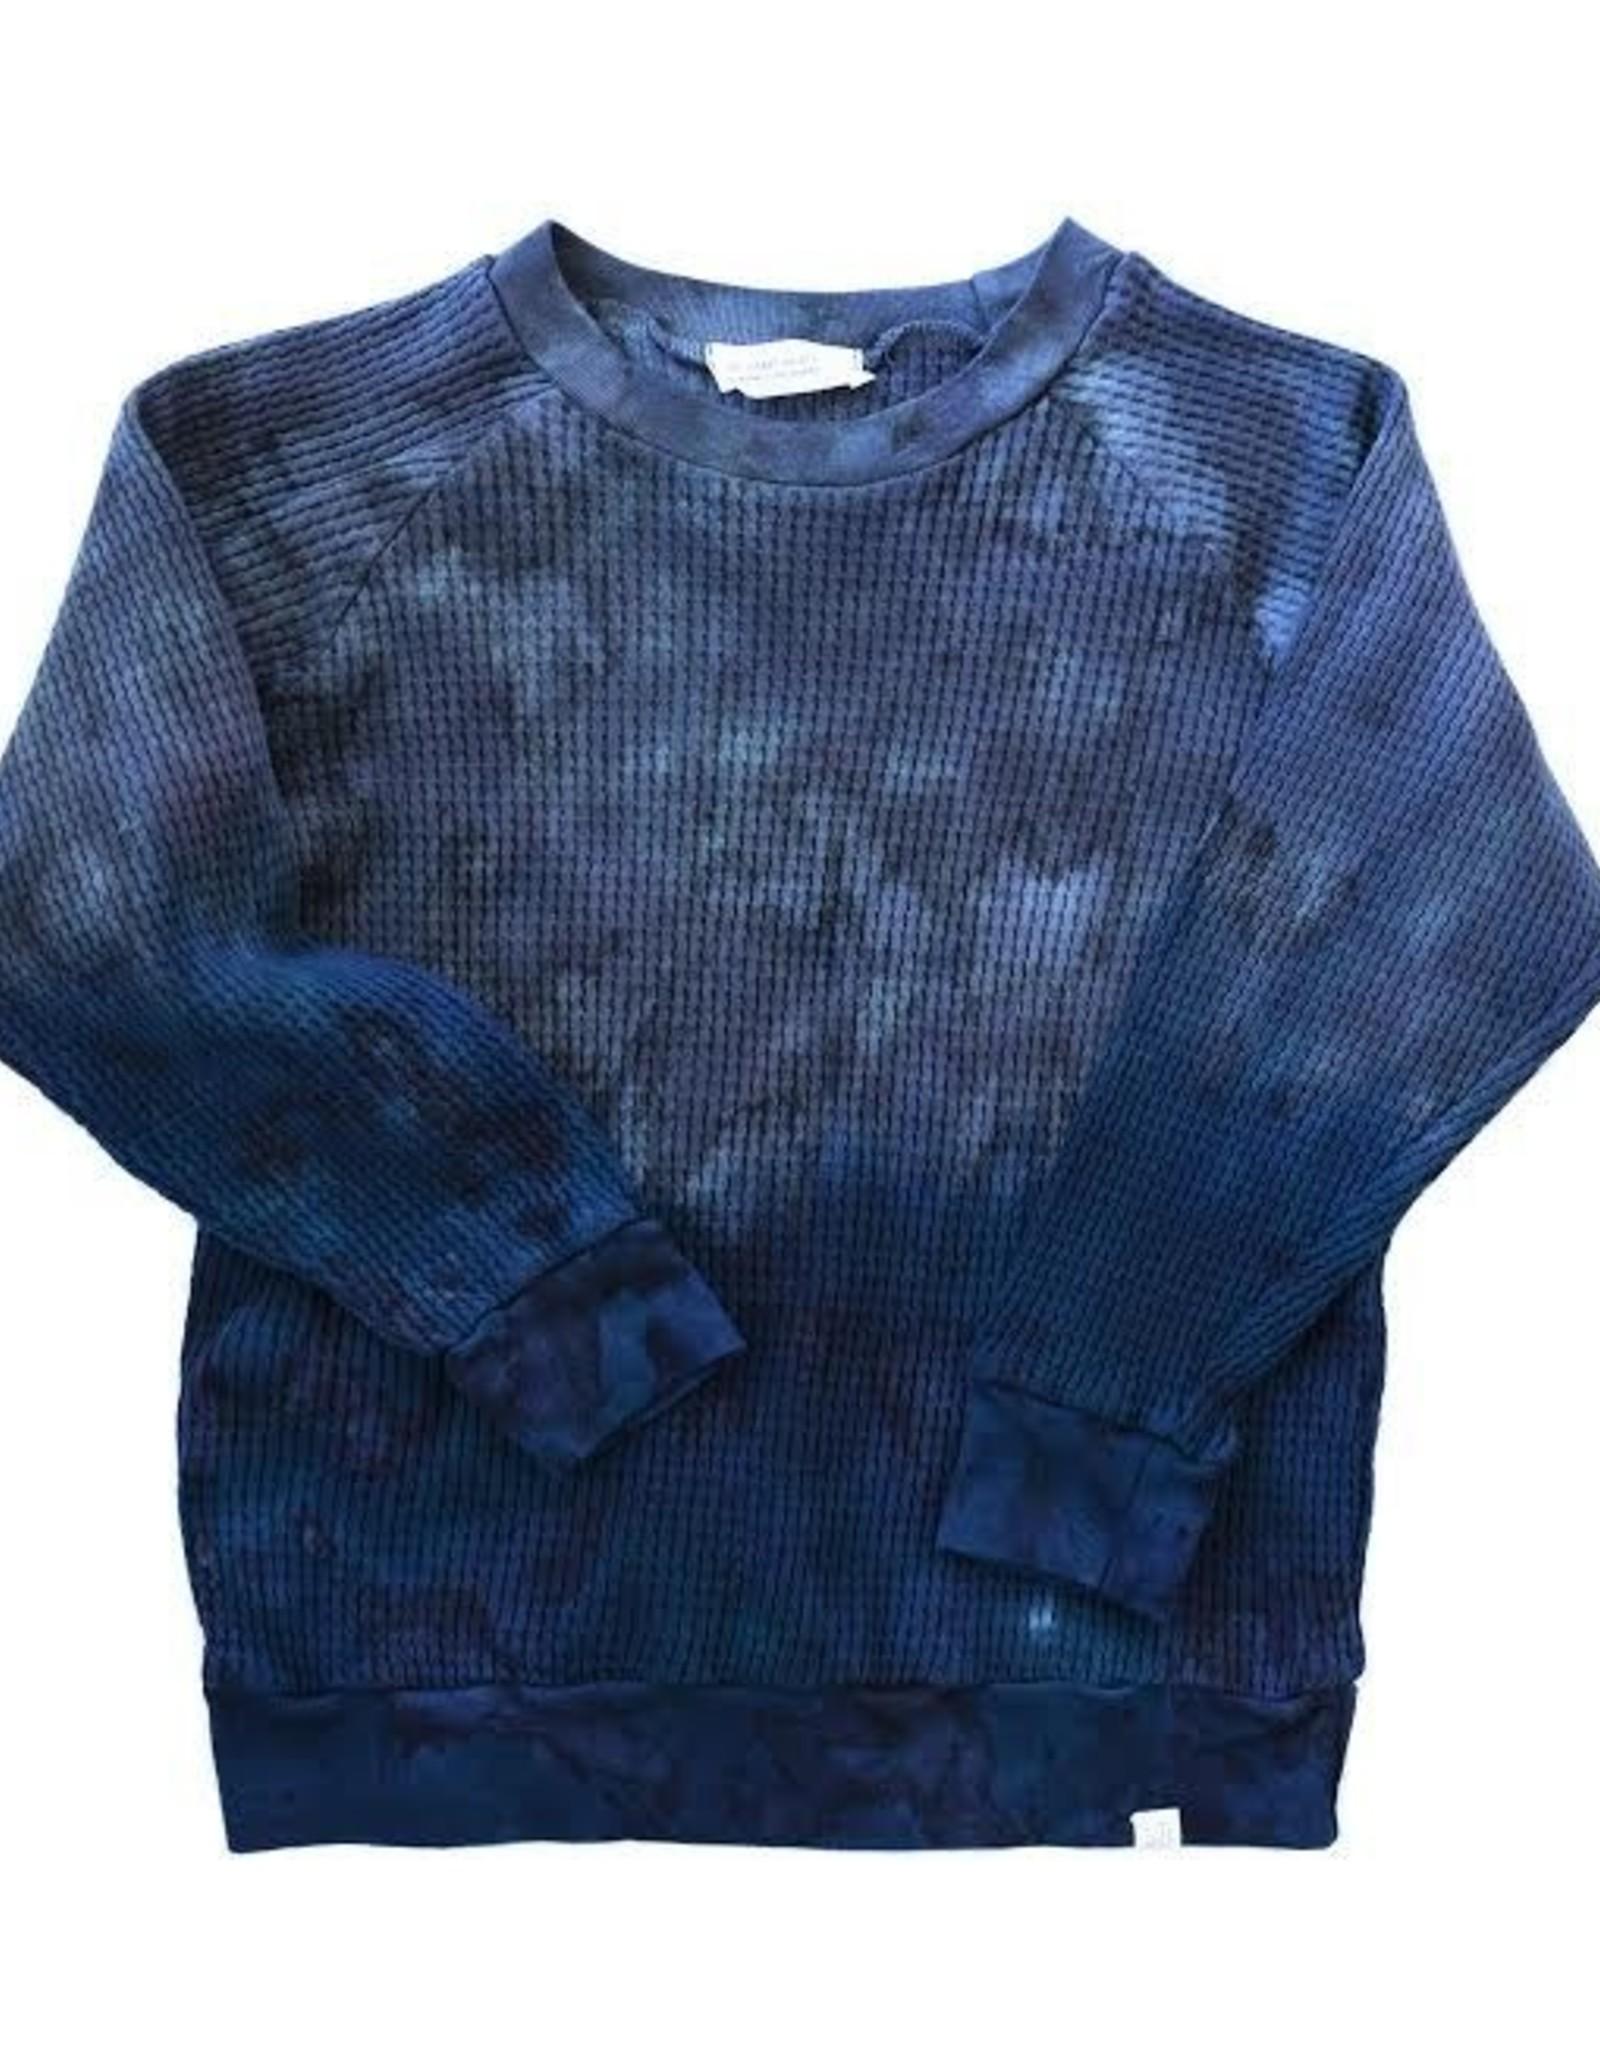 Little Moon Society joshie pullover- colbalt